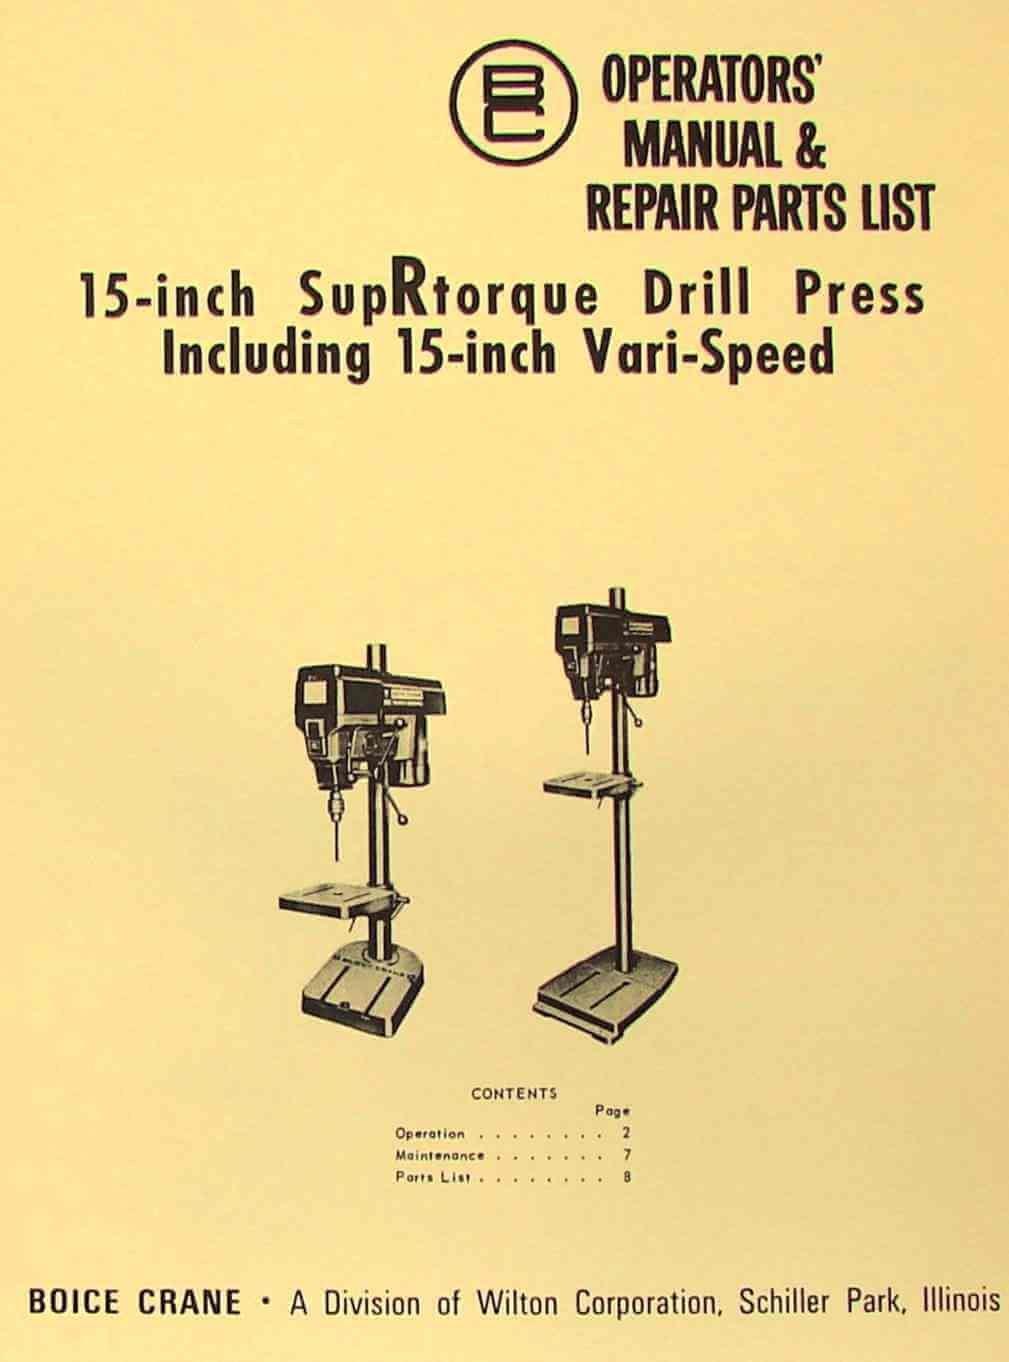 "BOICE CRANE 15"" SupRtorque & Vari-Speed Drill Press Instruction Part Manual:  Misc.: Amazon.com: Books"